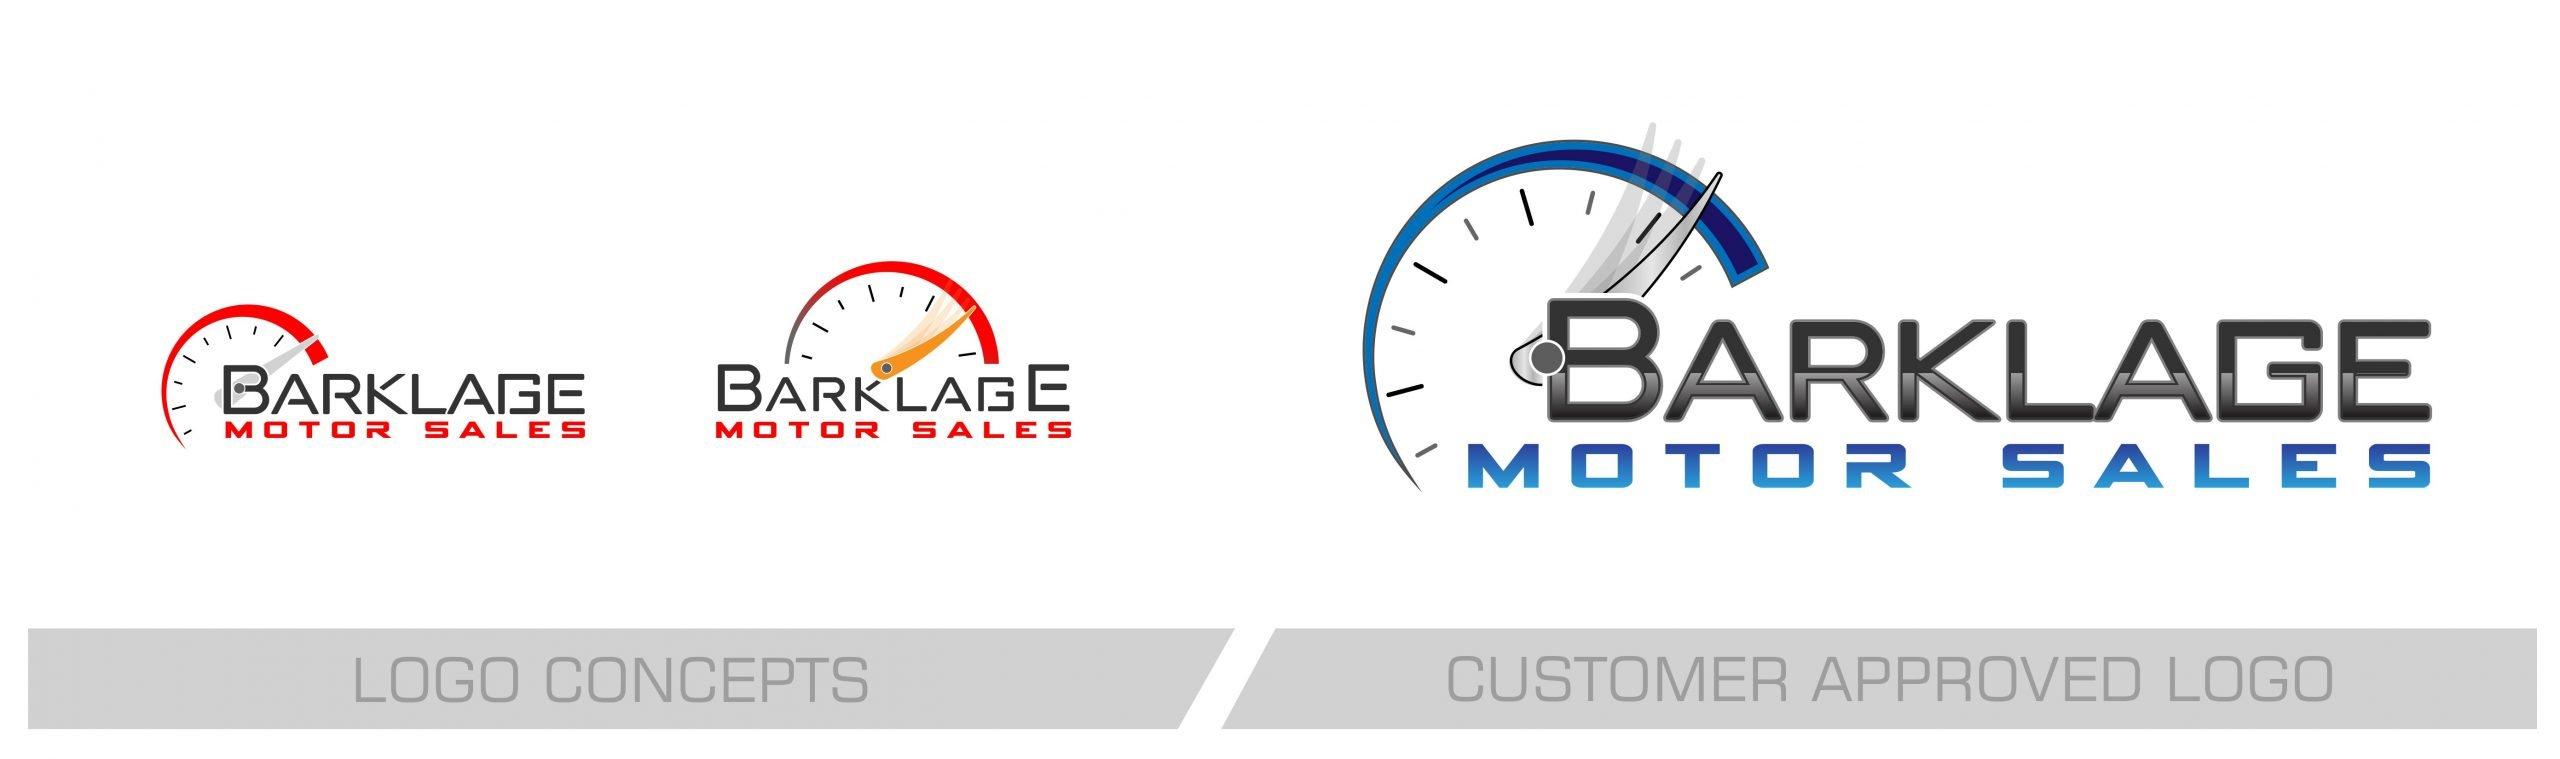 Barklage Motor Sales Logo Redesign